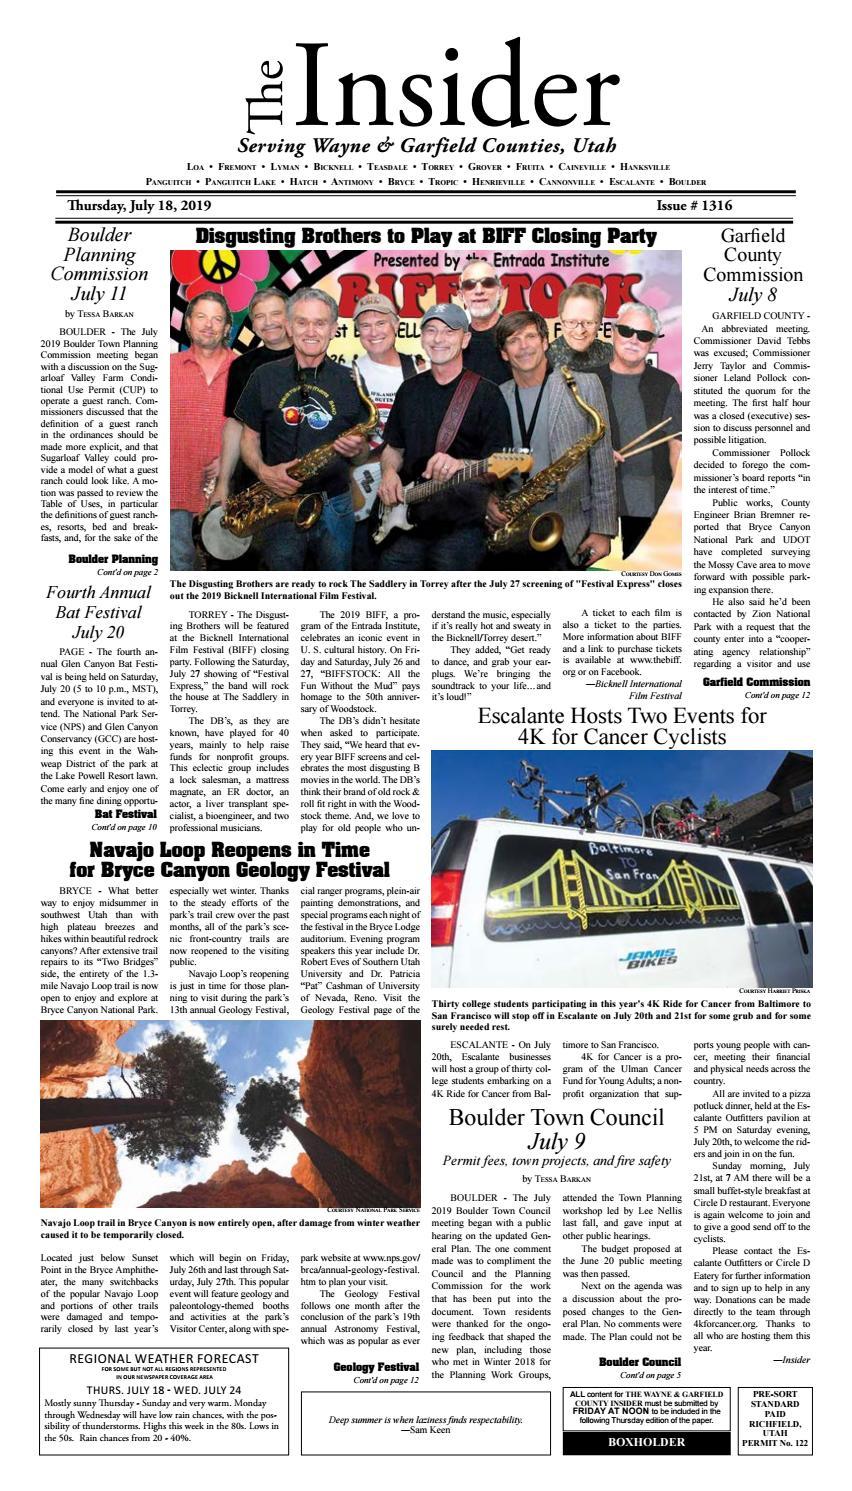 The Wayne & Garfield County Insider July 18, 2019 by